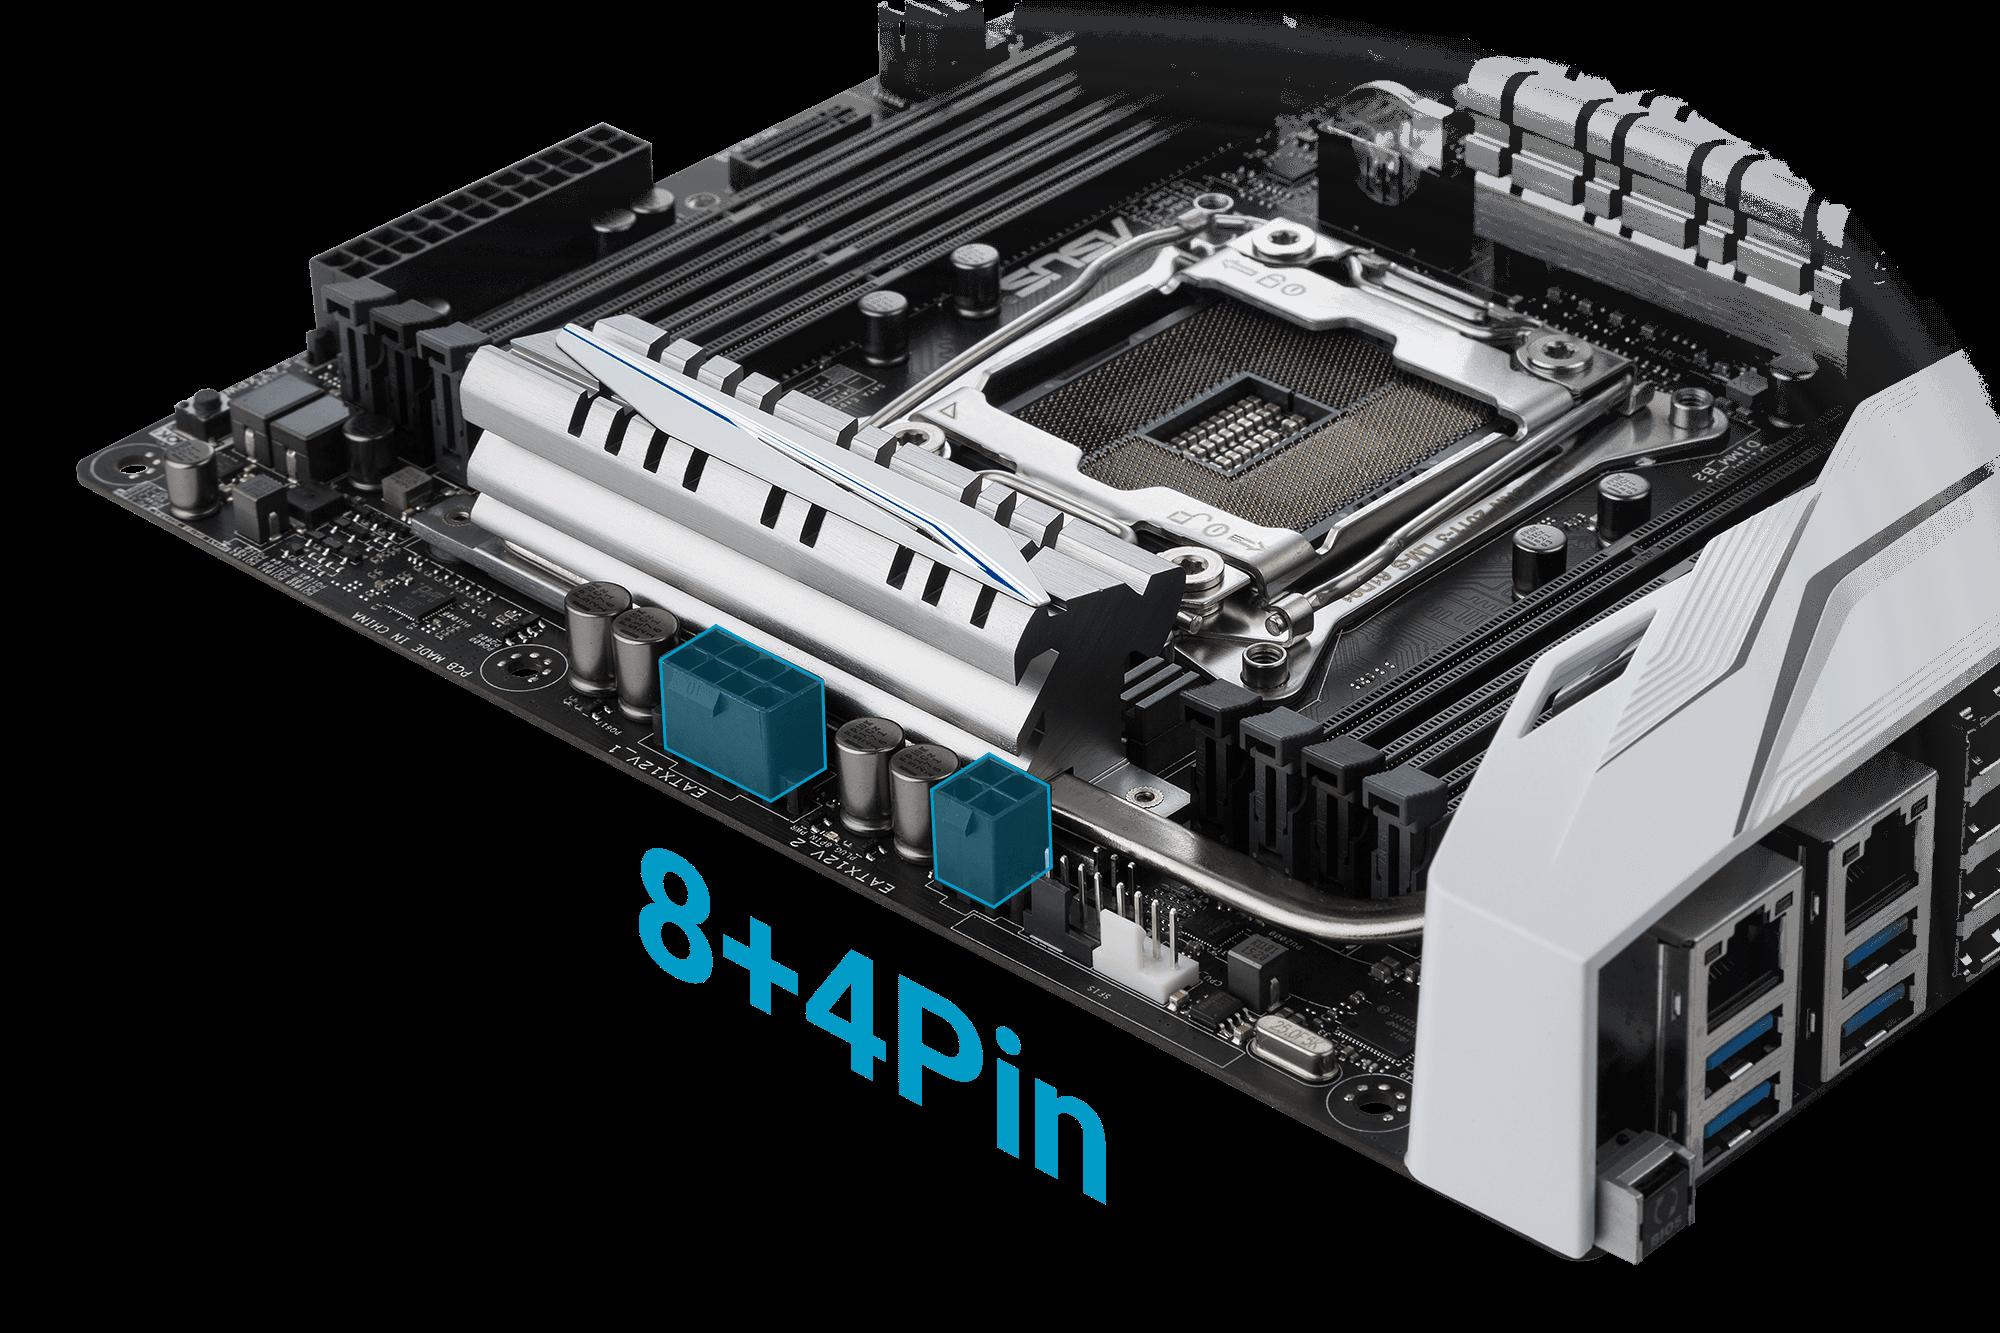 BIOS Chip ASUS X99-PRO